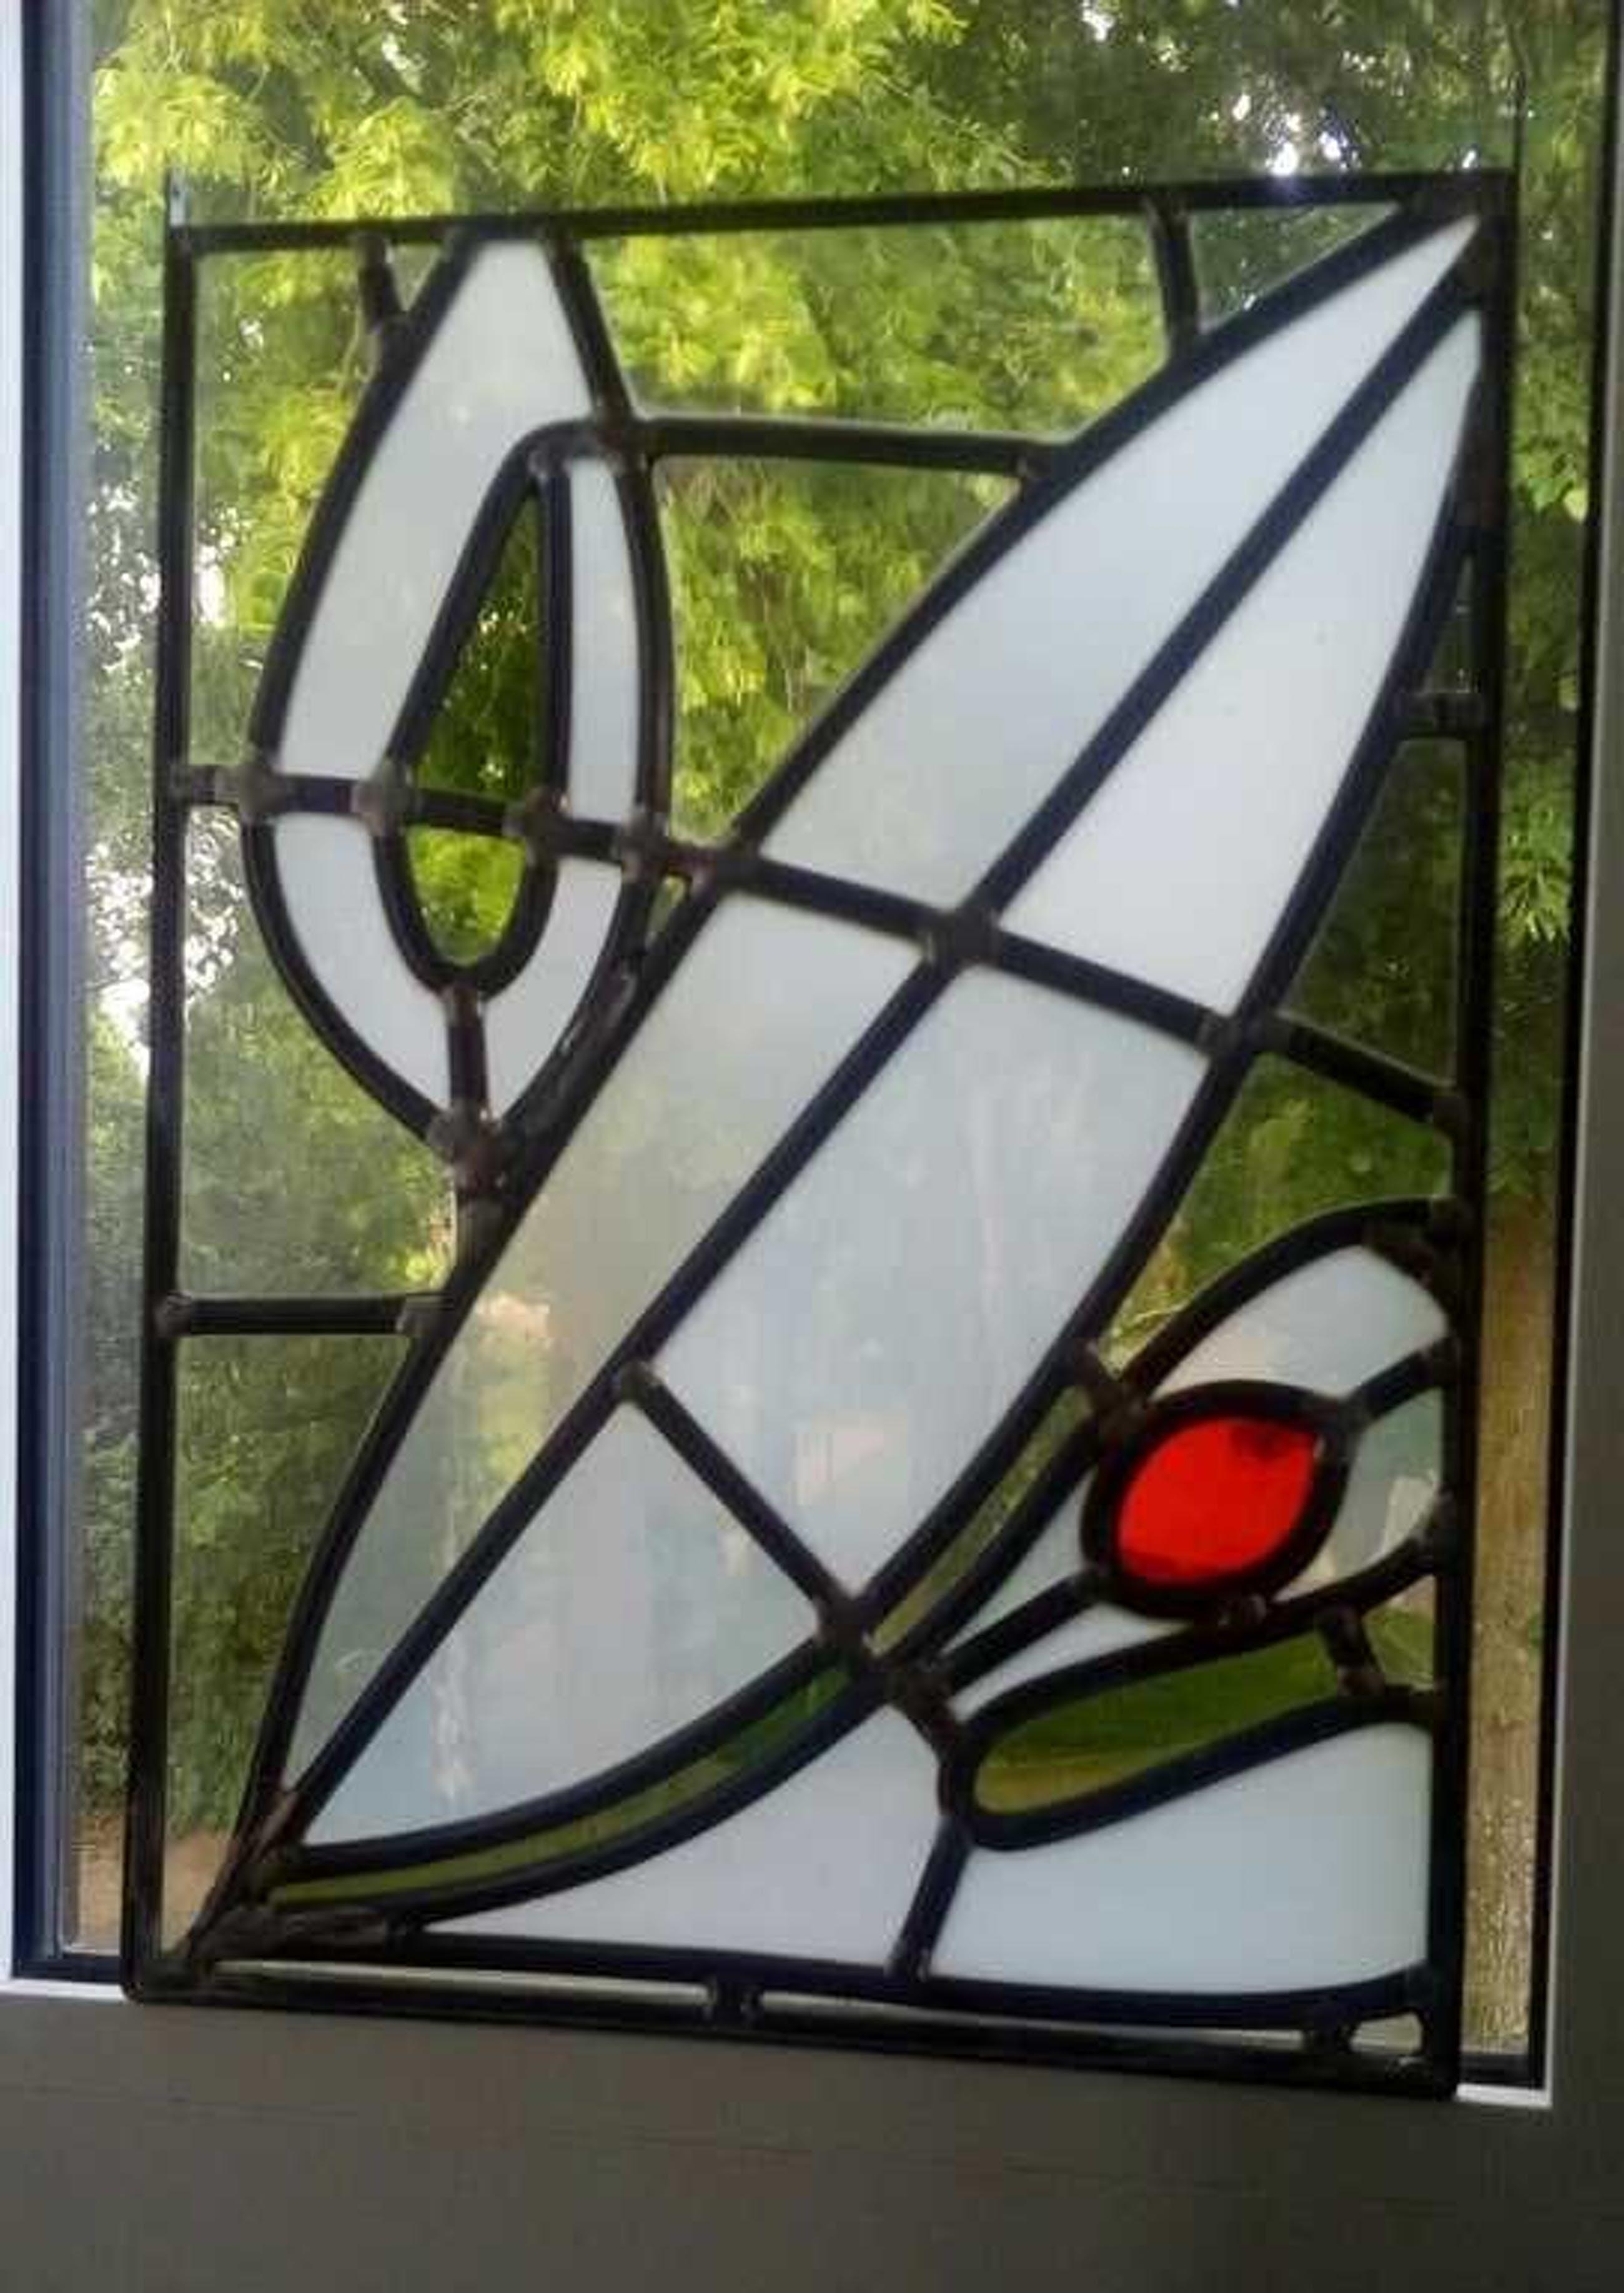 Goede Niet of onleesbaar gesigneerd - Glas-in-lood raamhanger, design FD-72